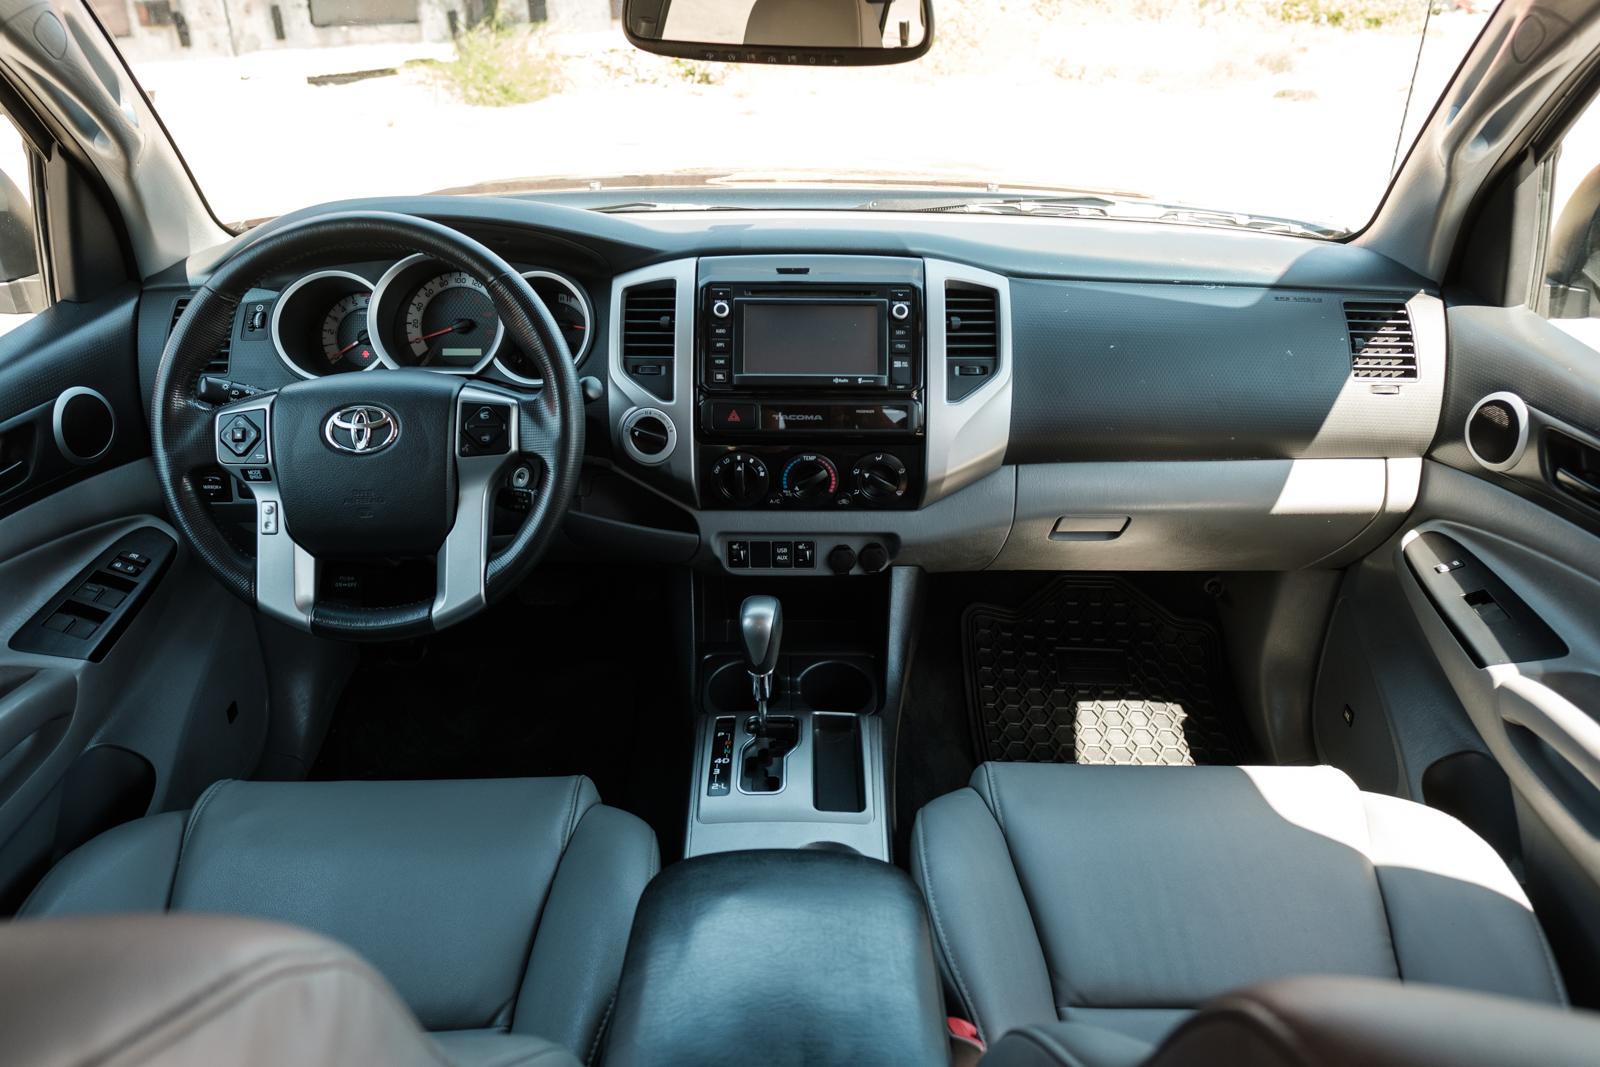 2001 Toyota Tacoma For Sale >> 2015 Toyota Tacoma 4x4 Limited - Silver Arrow Cars Ltd.